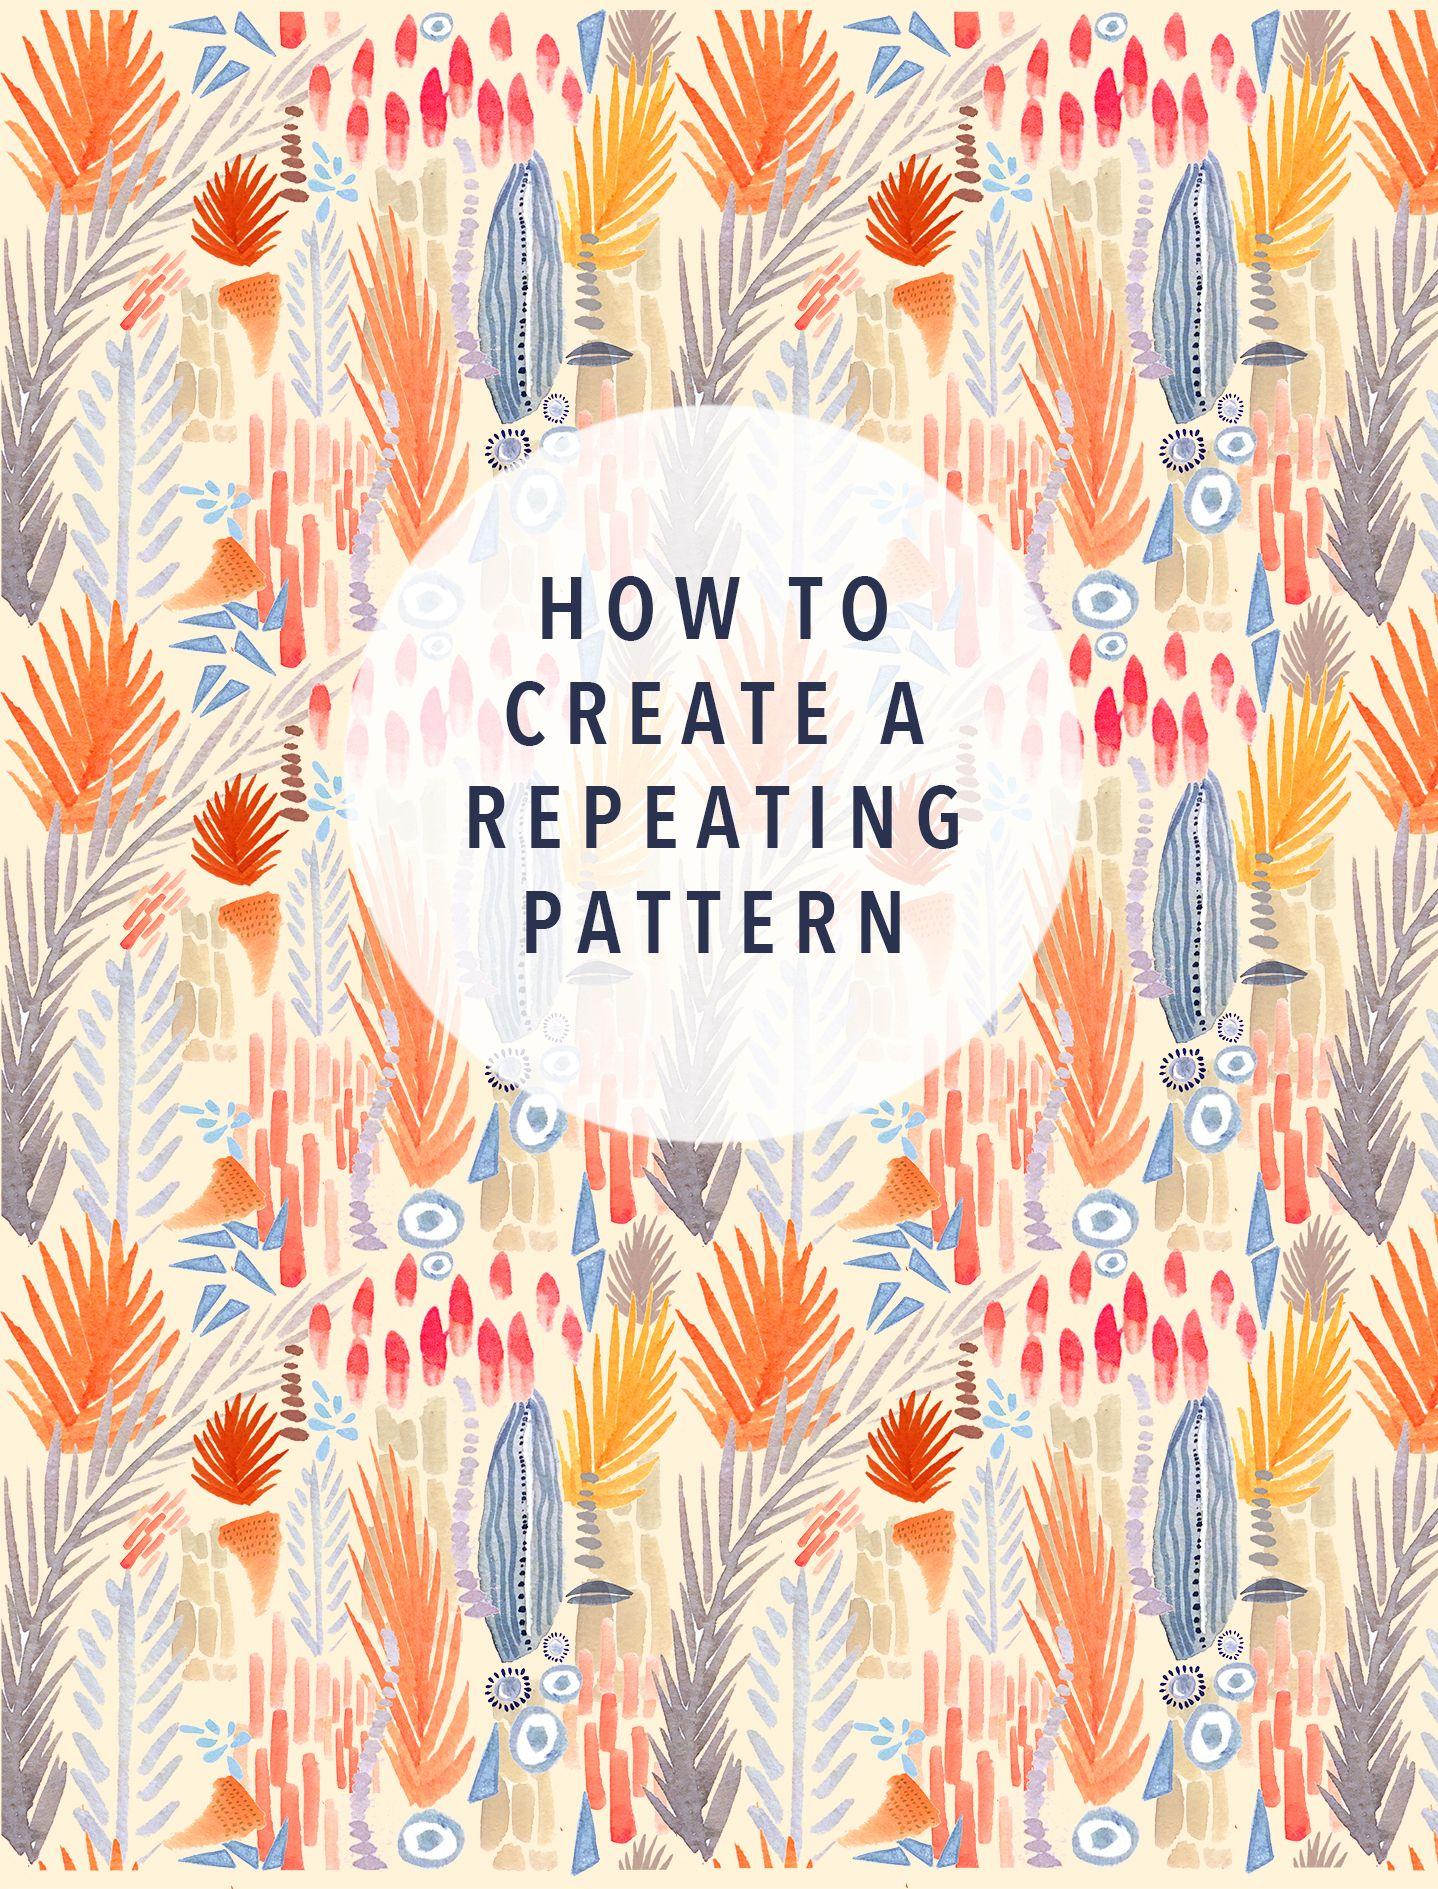 Repeating Pattern Tutorial